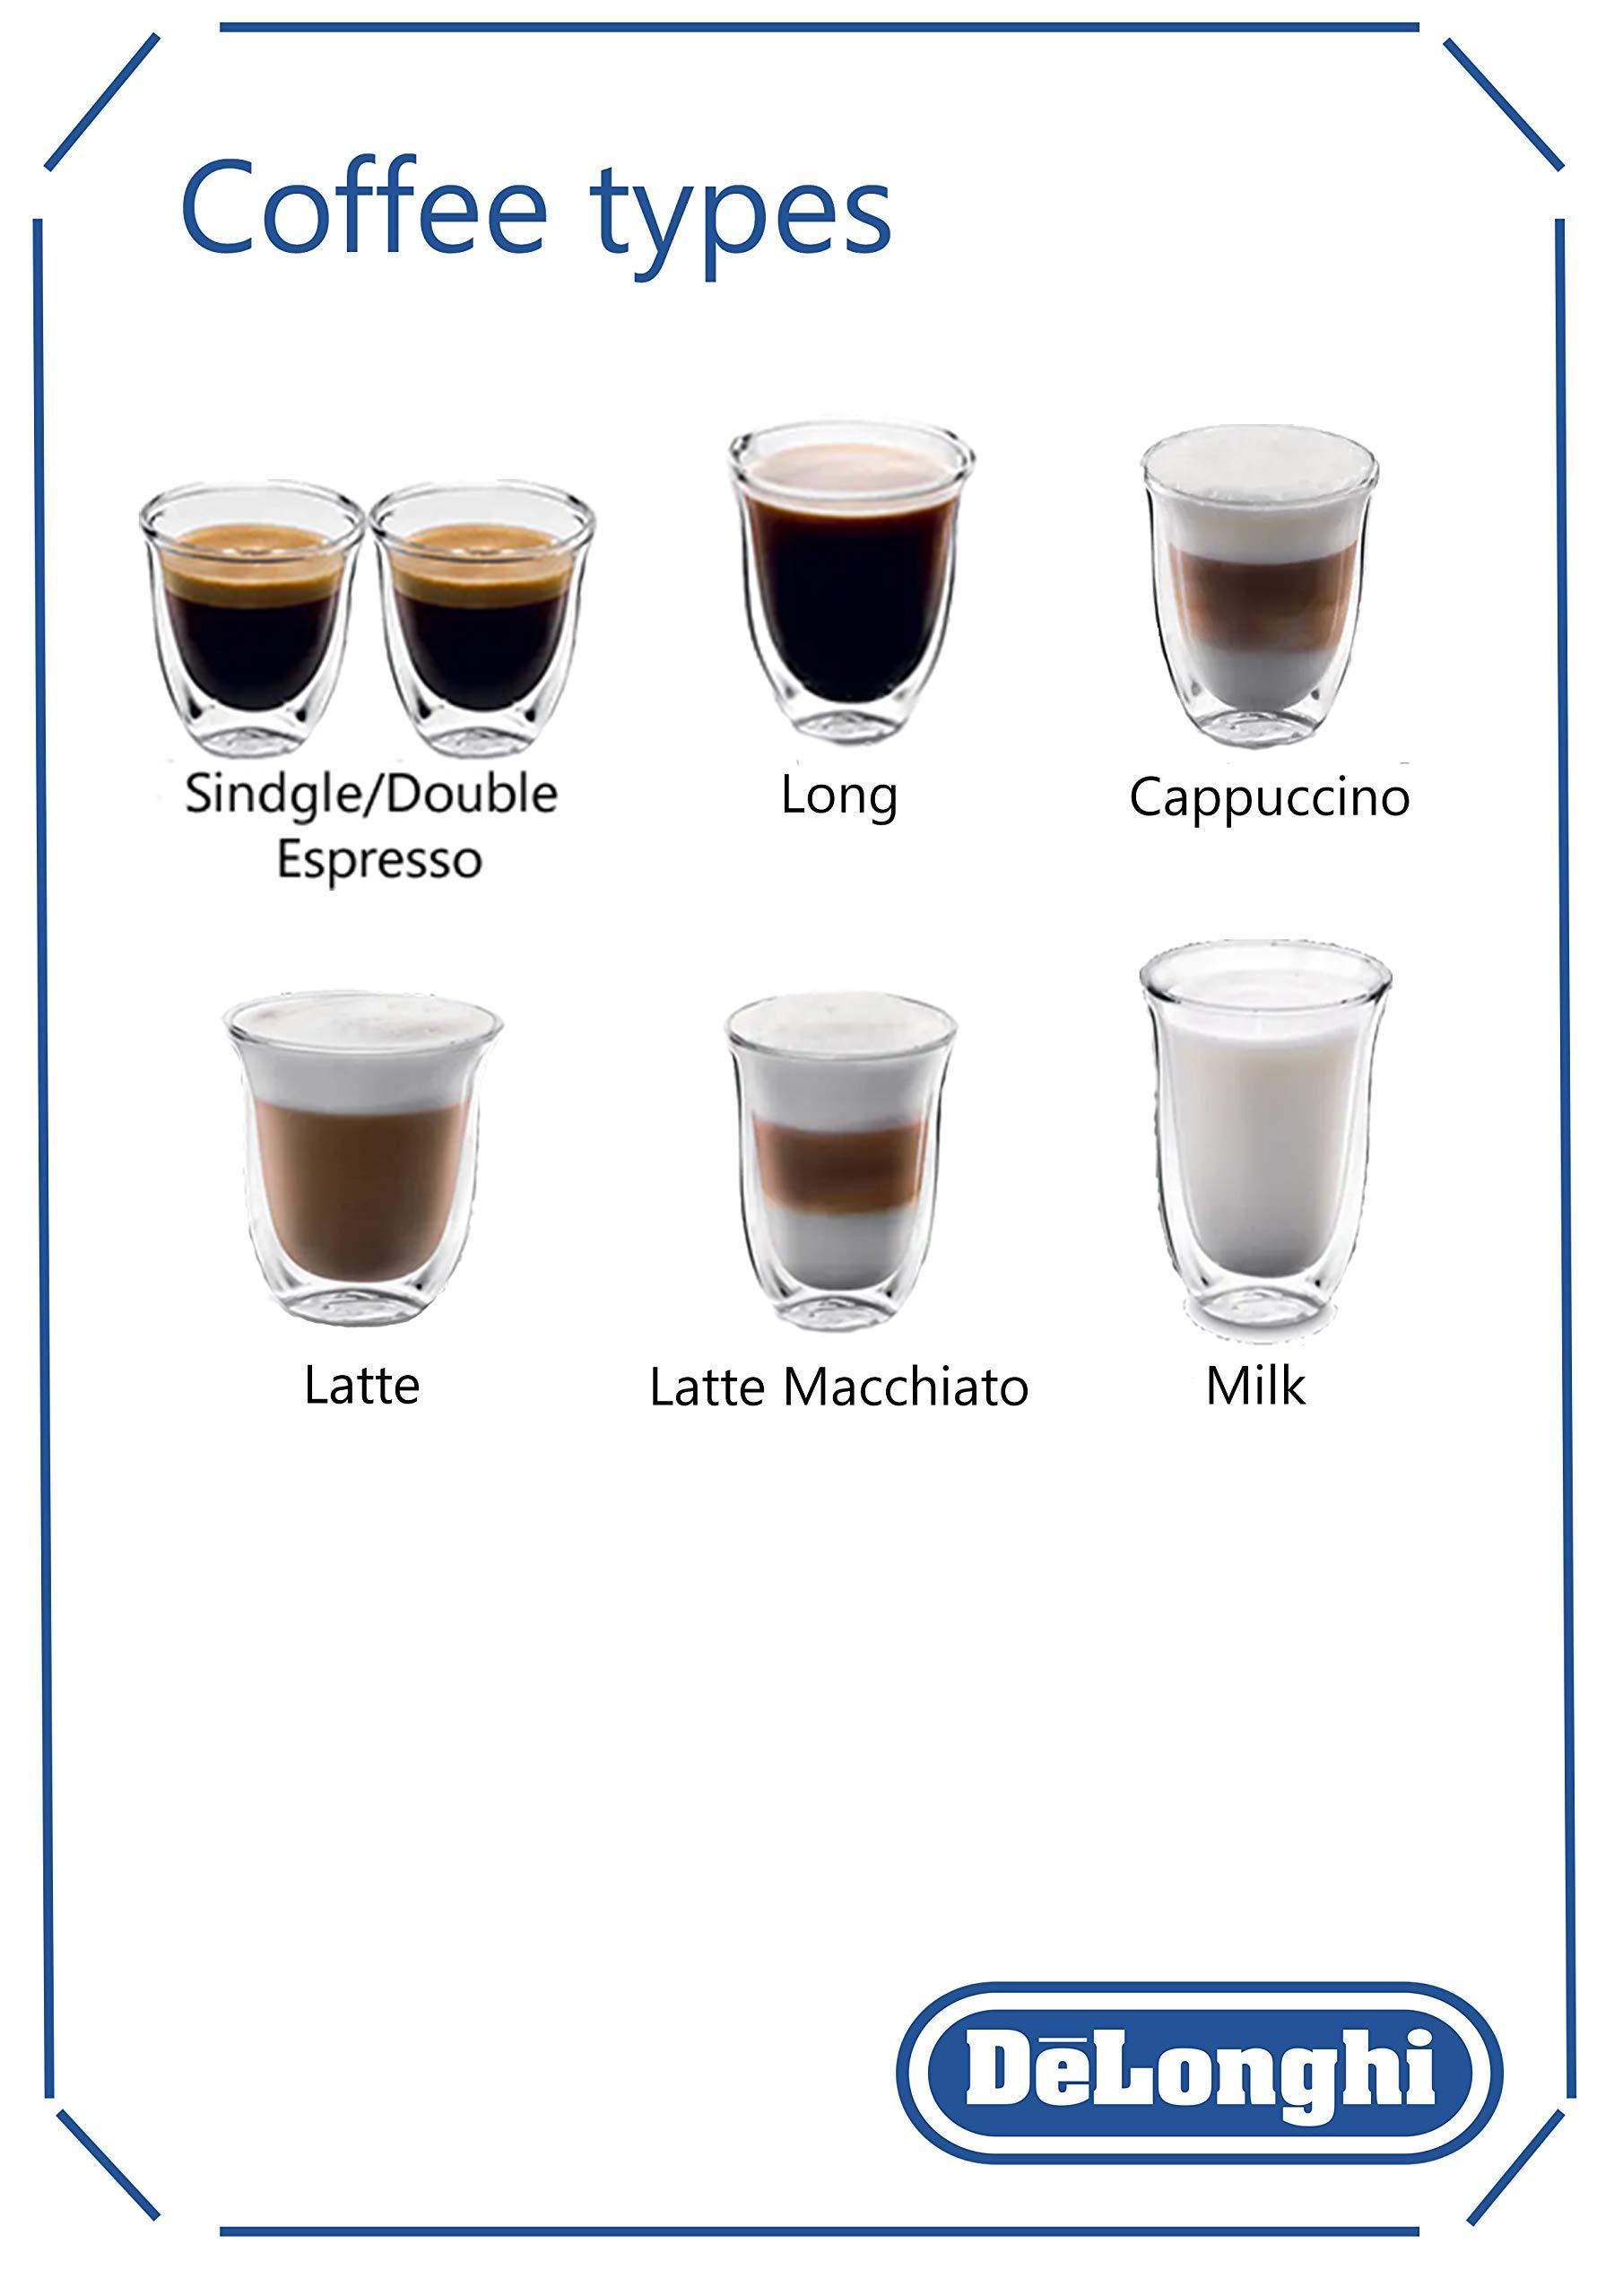 71P8g7rVTxL - De'Longhi Fully Automatic Bean to Cup Coffee Machine ECAM25.462.B, 220 W